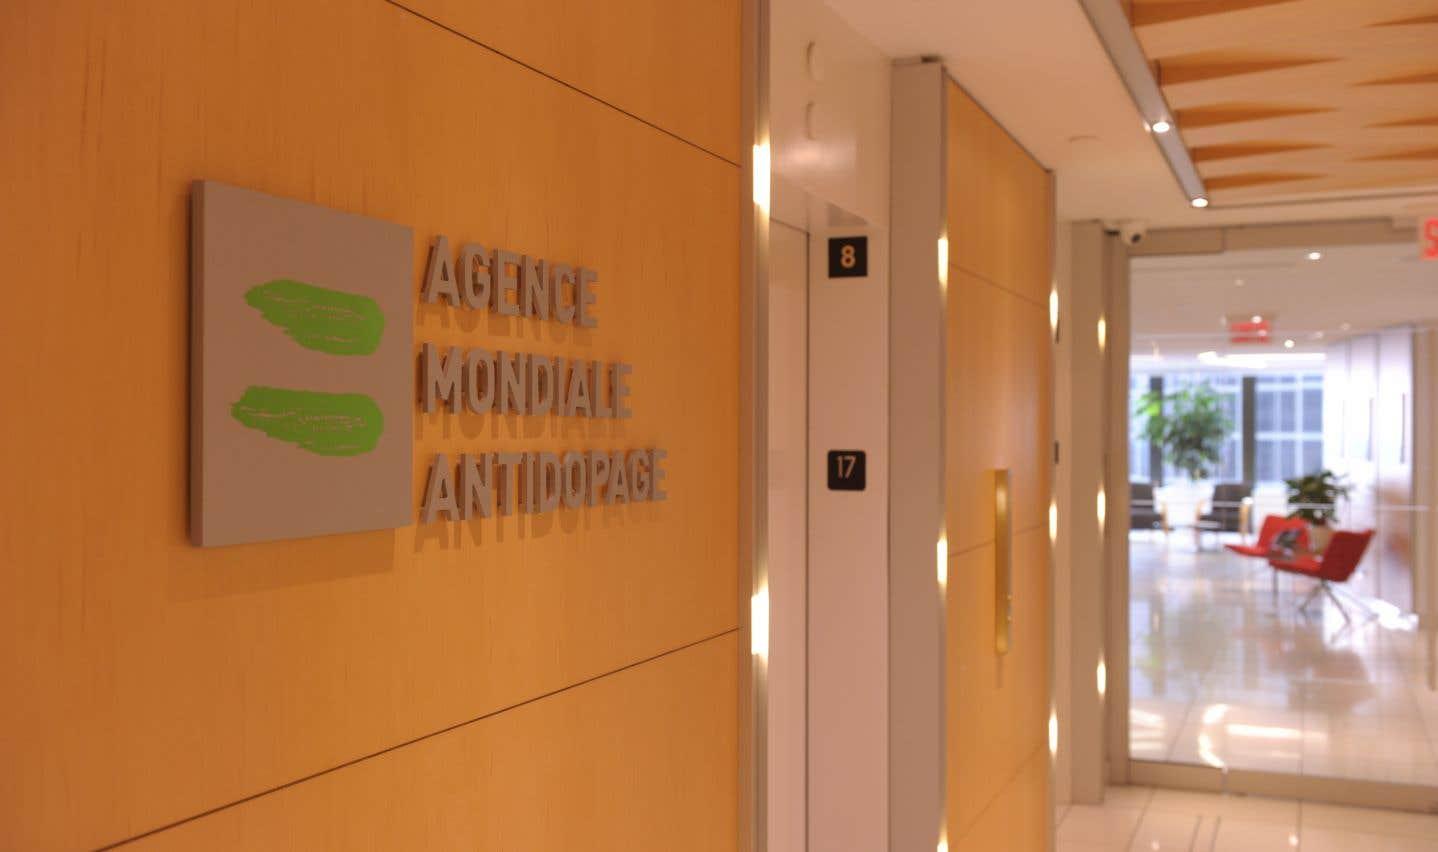 Olympisme: l'Agence mondiale antidopage restera à Montréal